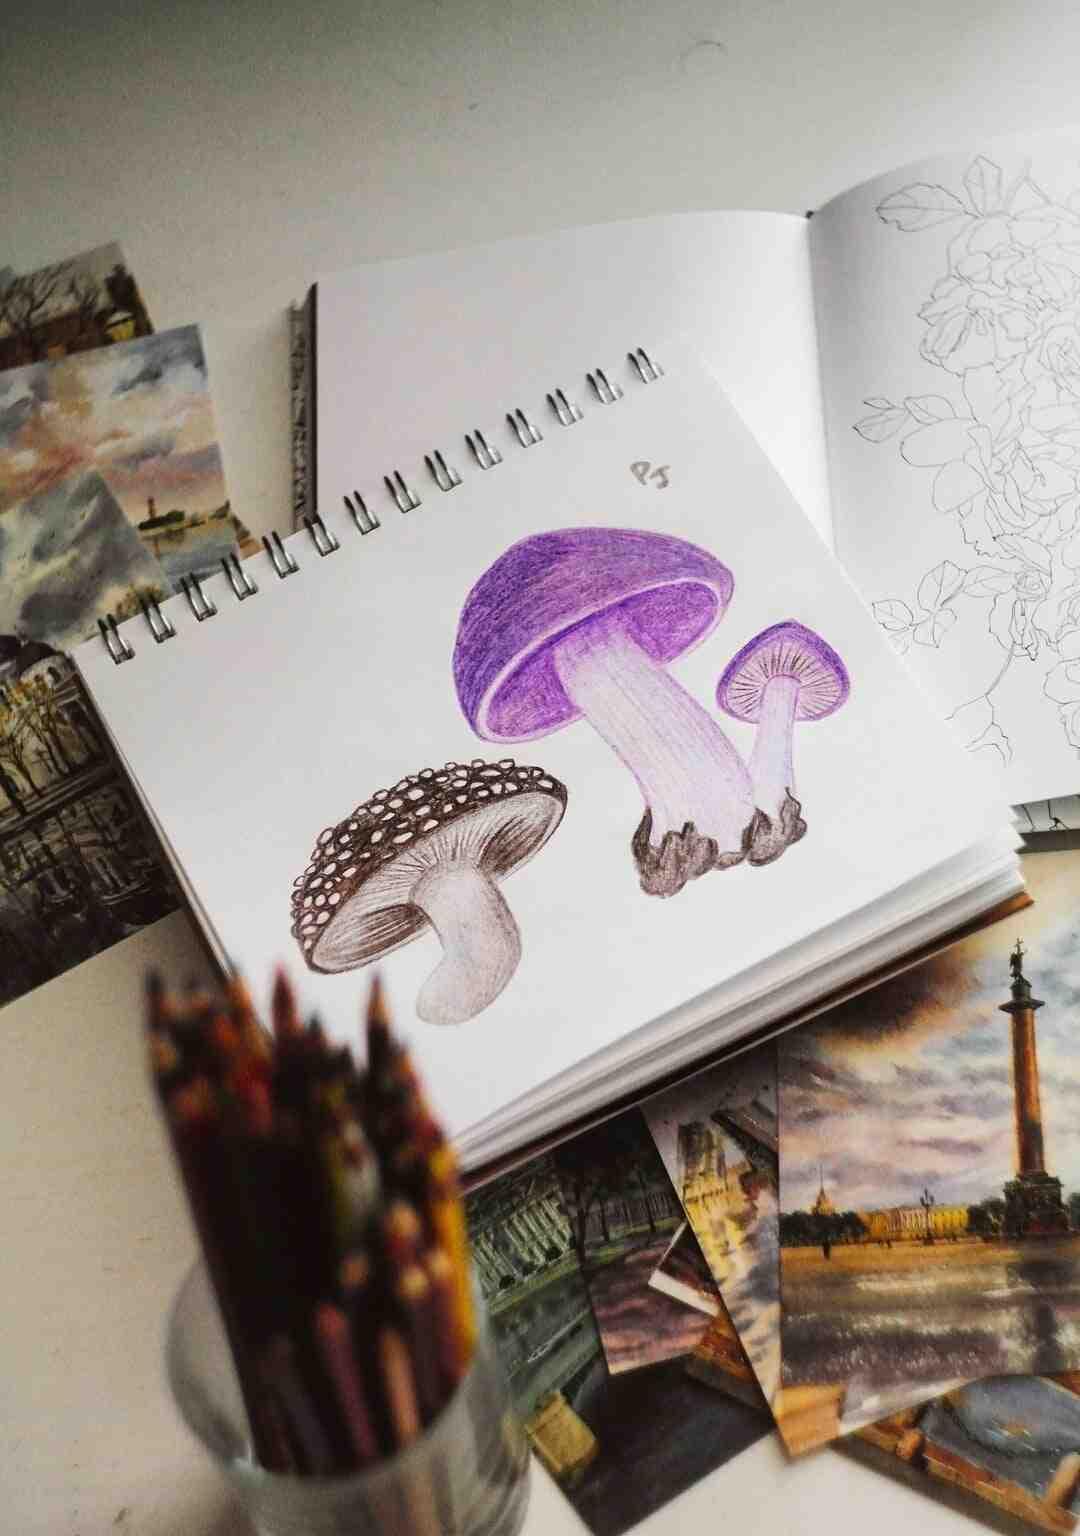 Comment utiliser des crayons aquarellables